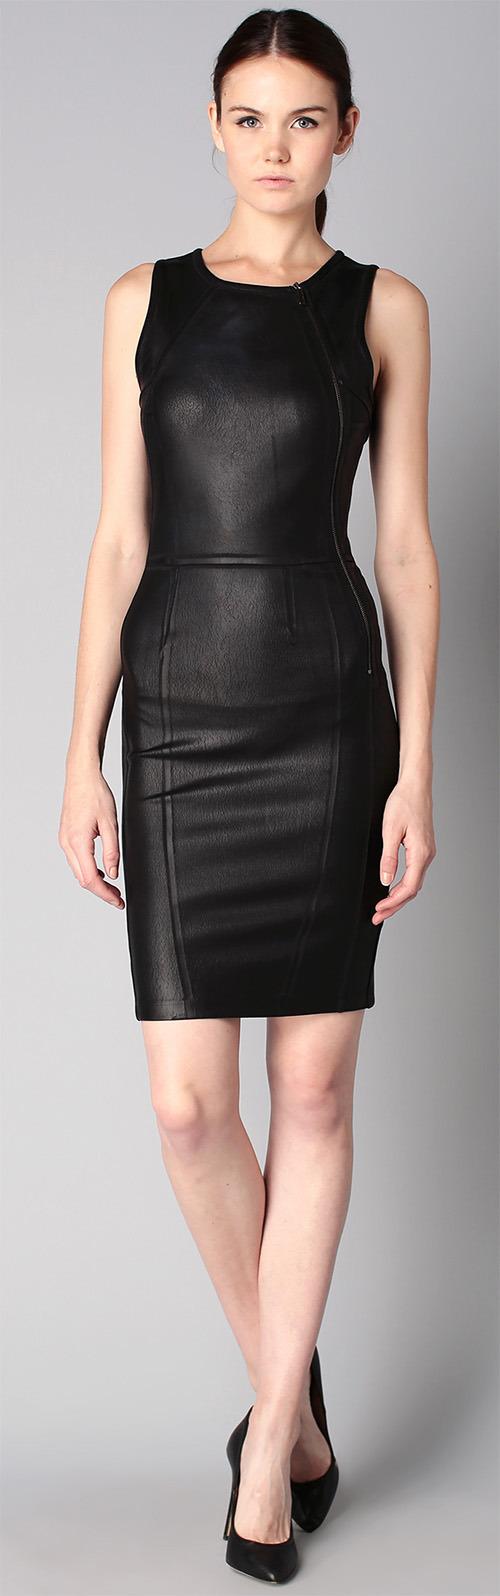 Robe courte noire en similicuir moulante Calvin Klein